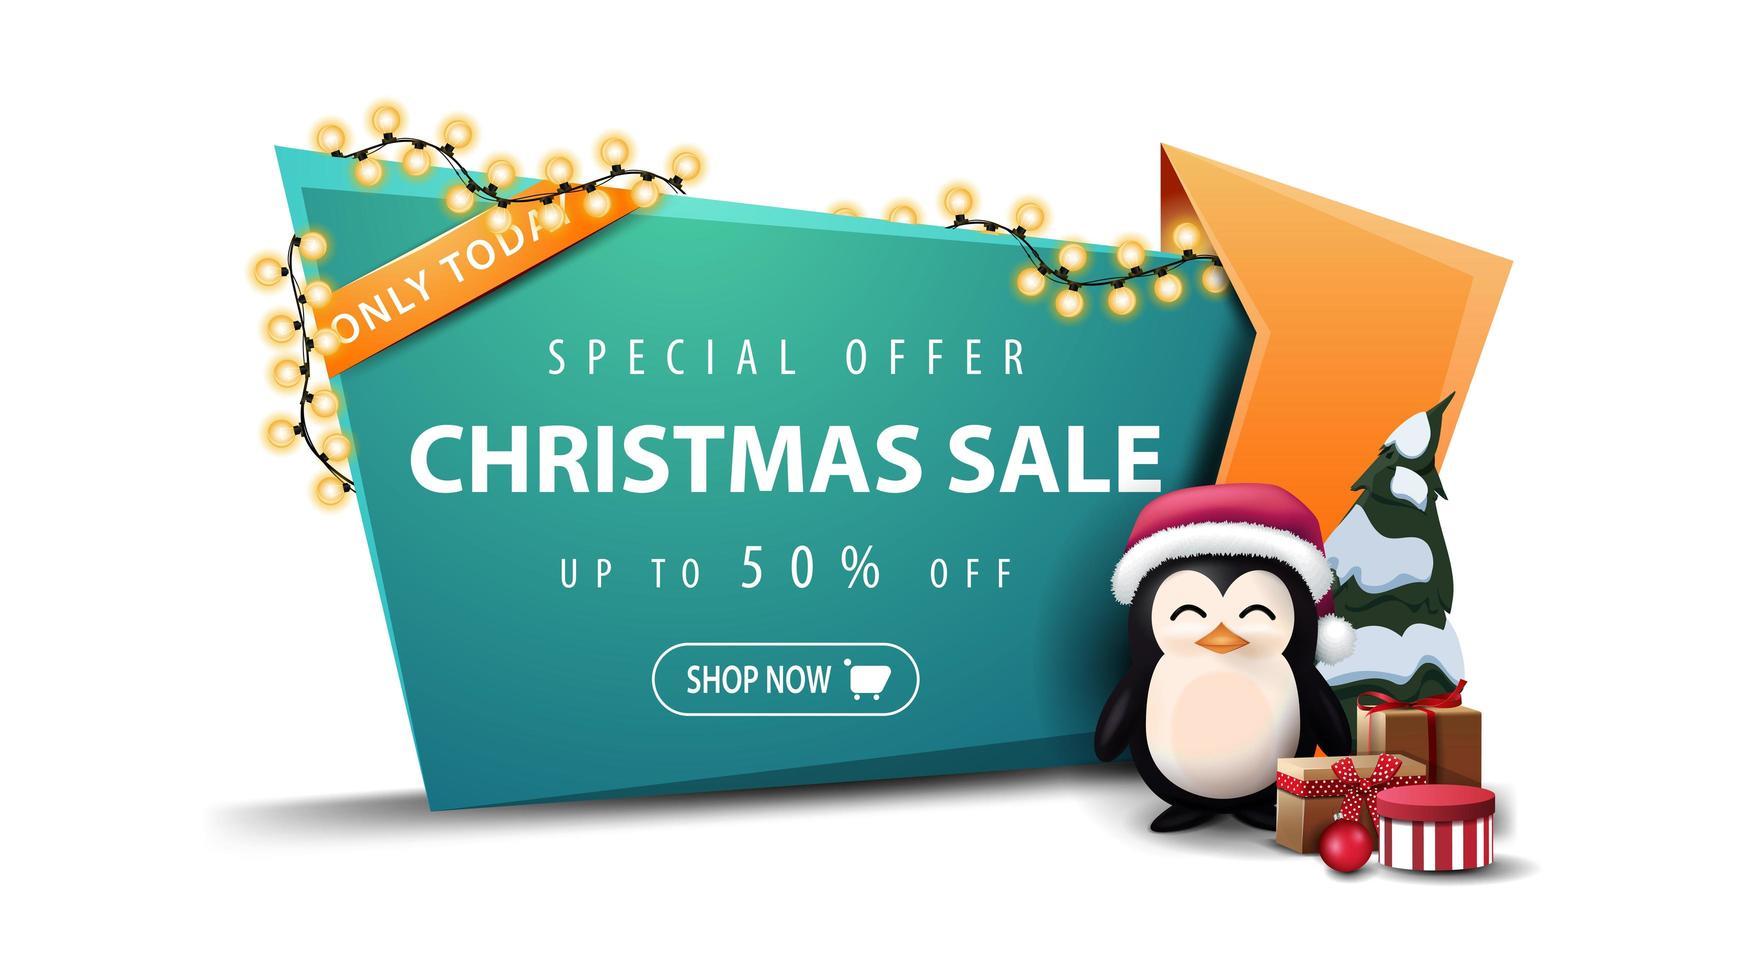 speciale aanbieding, kerstuitverkoop, tot 50 korting, groene kortingsbanner in wondkrans in cartoon-stijl met pinguïn in kerstmanhoed met cadeautjes vector